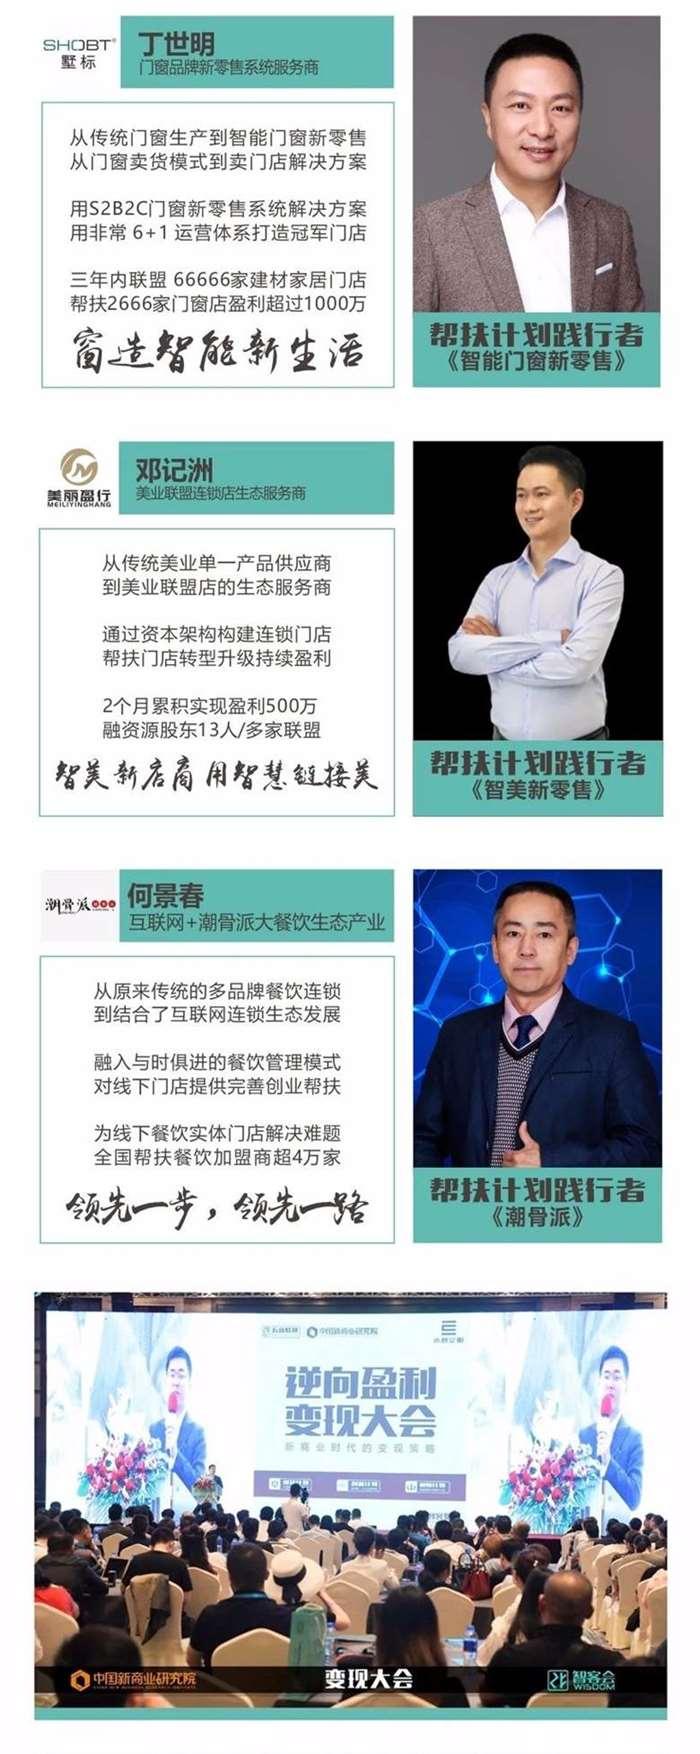 http://www.huodongxing.com/file/20191113/1063603644976/443617916306528.jpg